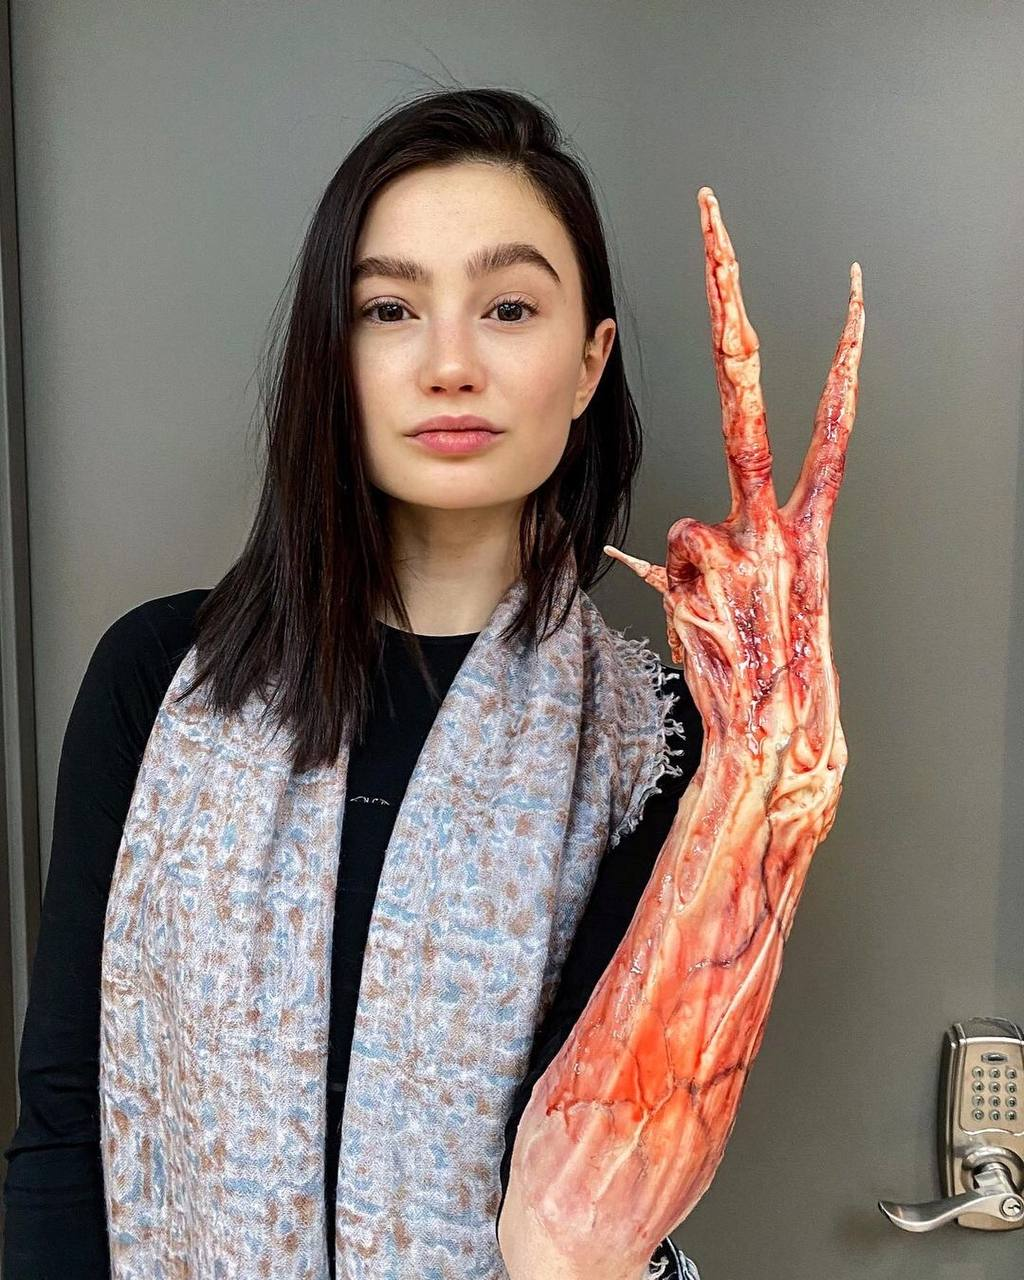 марина мазепа украинка голливуд танцовщина артистка нечестивый